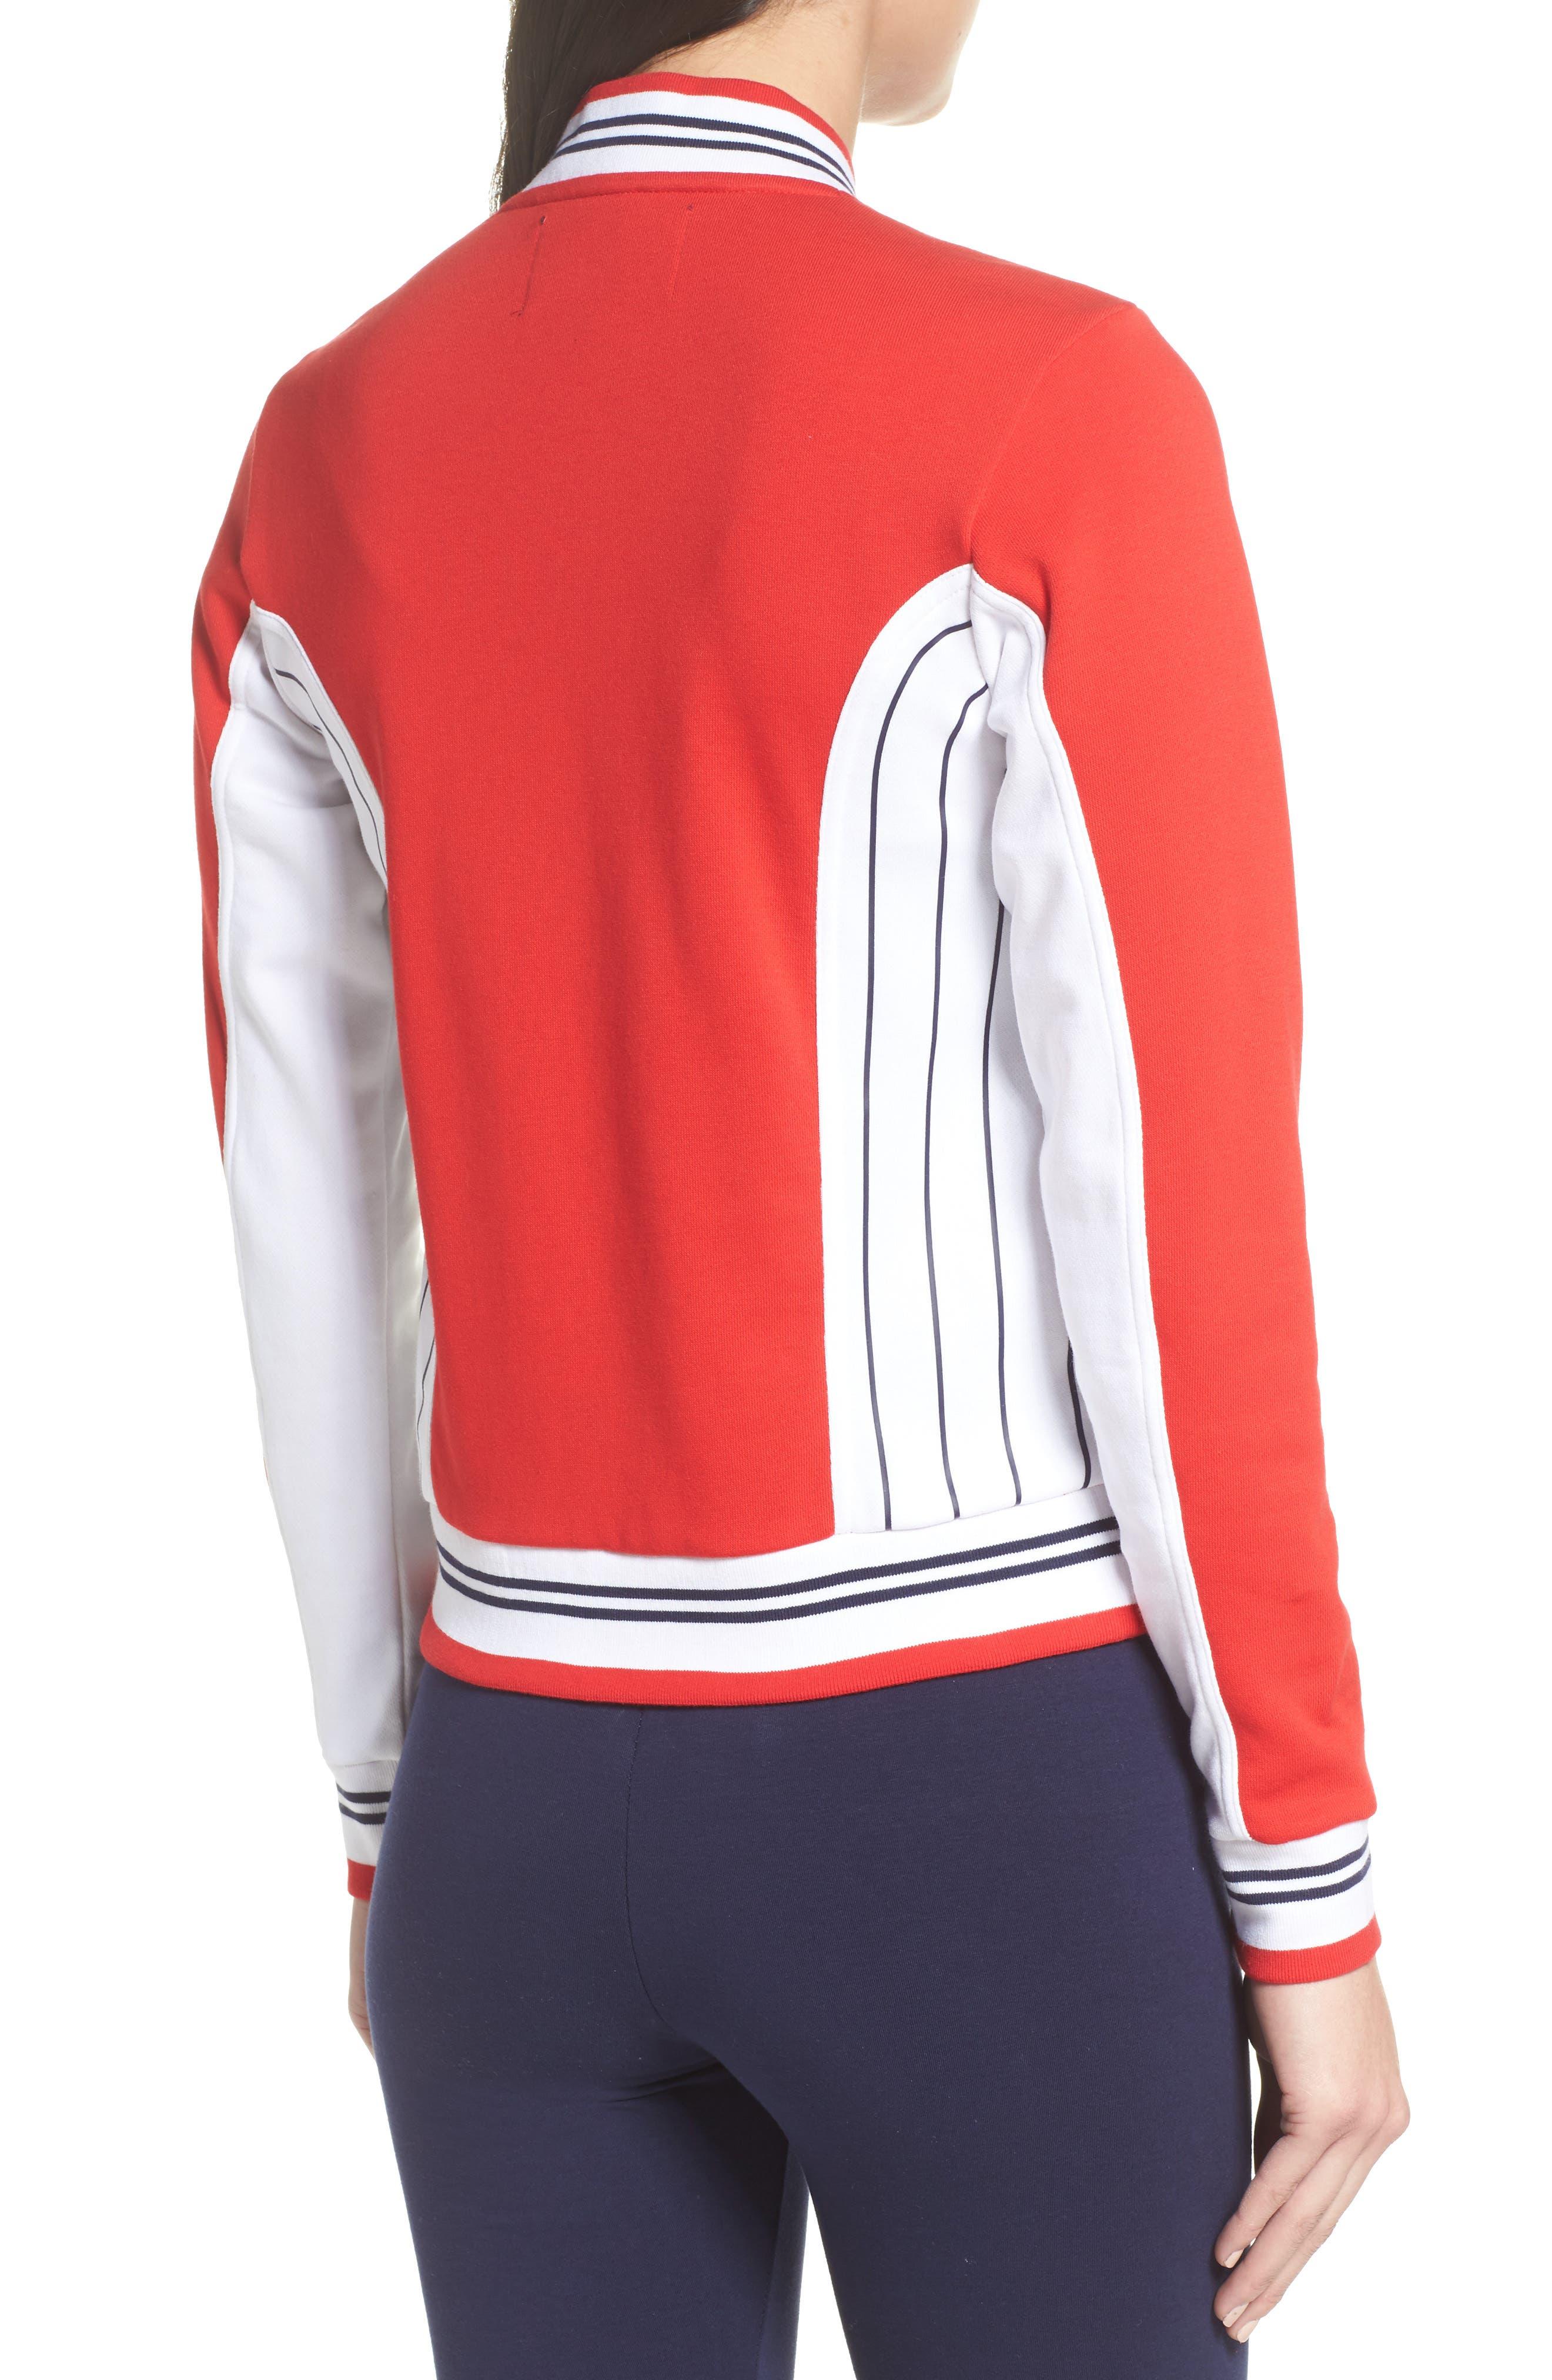 Settanta II Jacket,                             Alternate thumbnail 2, color,                             Chinese Red/ White/ Navy